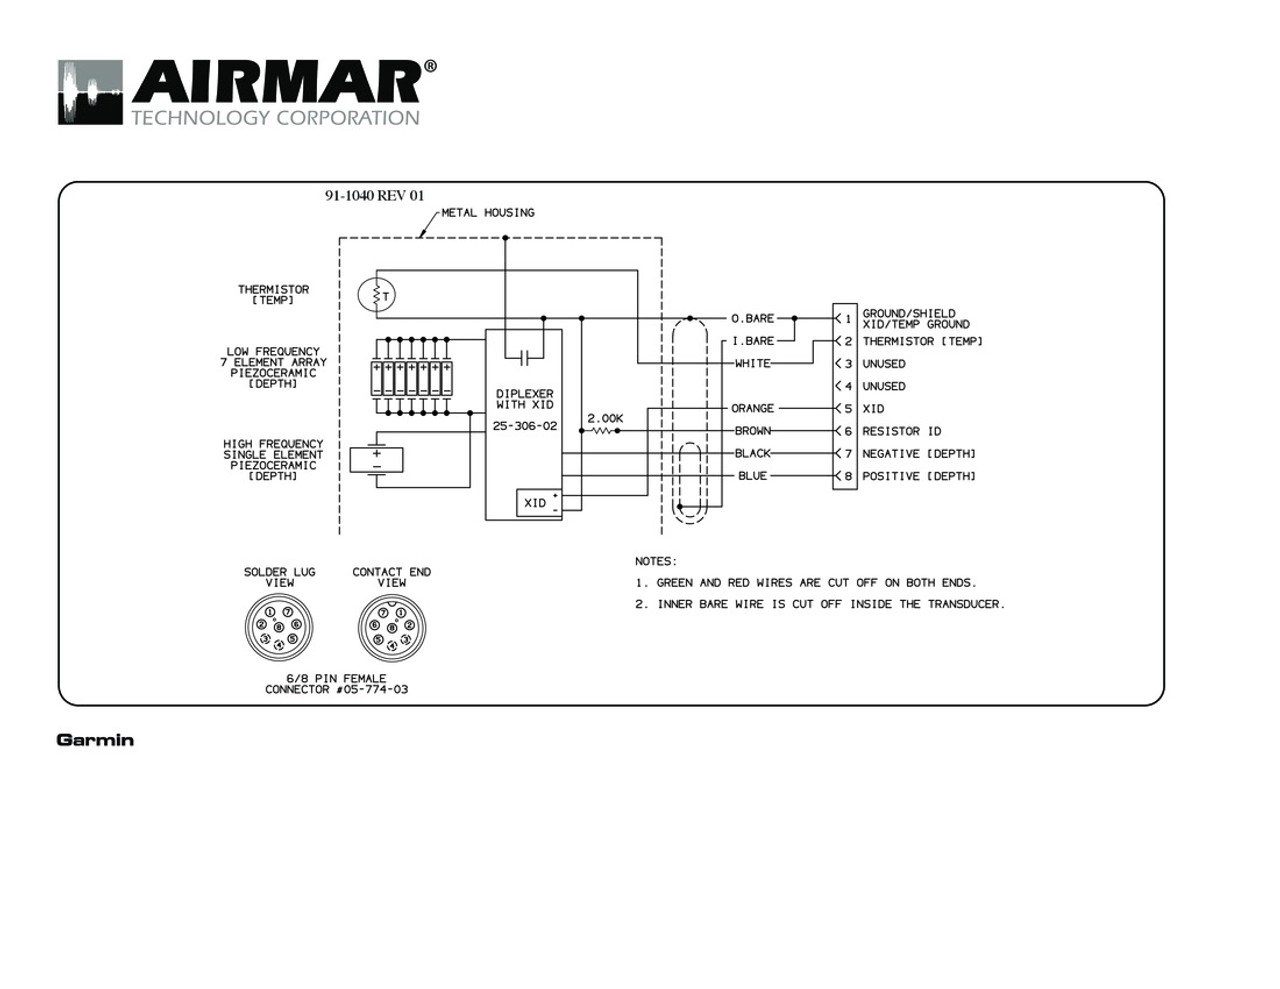 small resolution of airmar wiring diagram garmin 1kw 8 pin d t blue bottle marinedepth